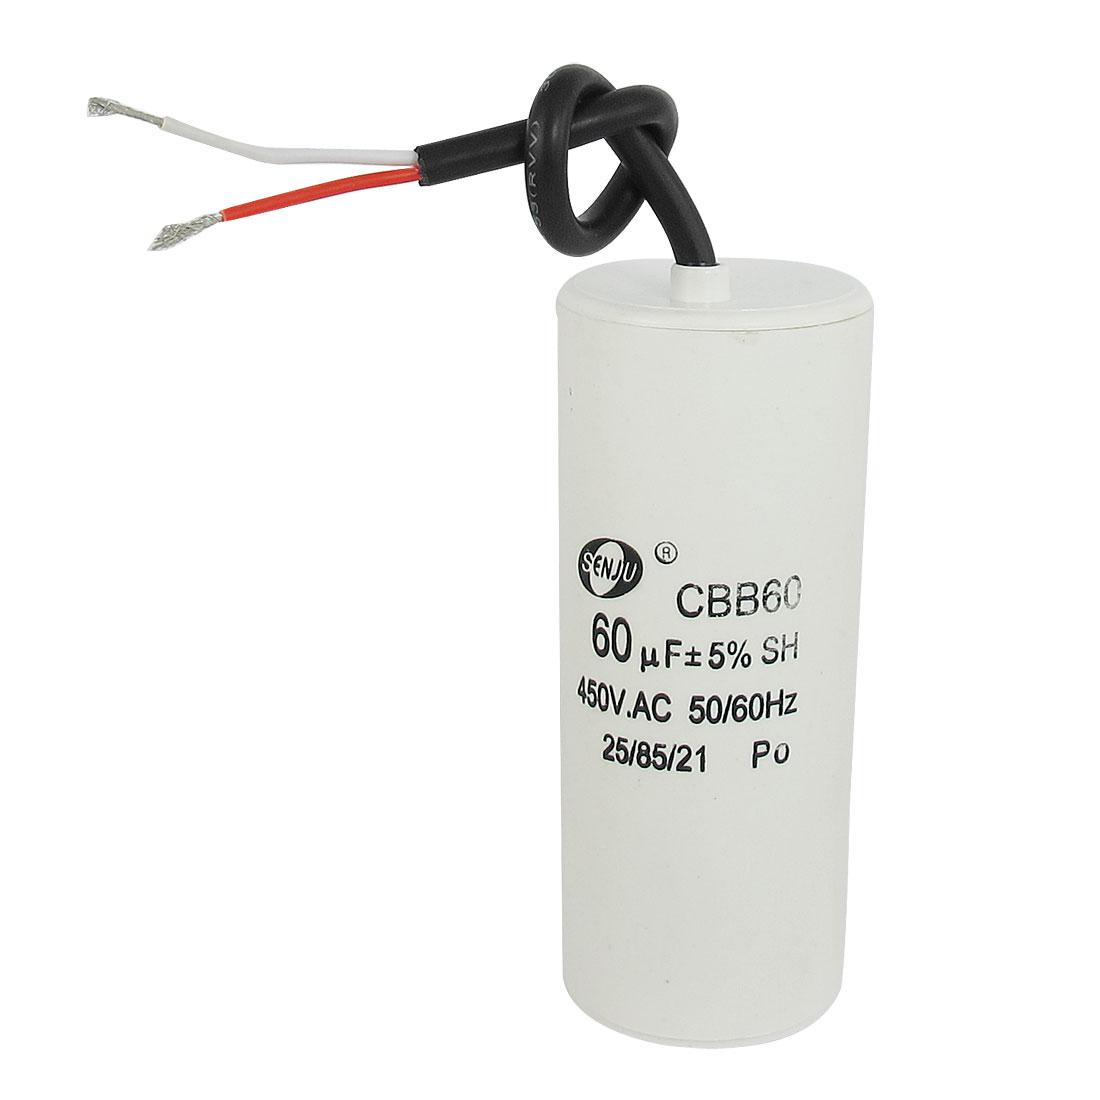 CBB60 450VAC 60uF 5% Wired Terminal Motor Capacitor